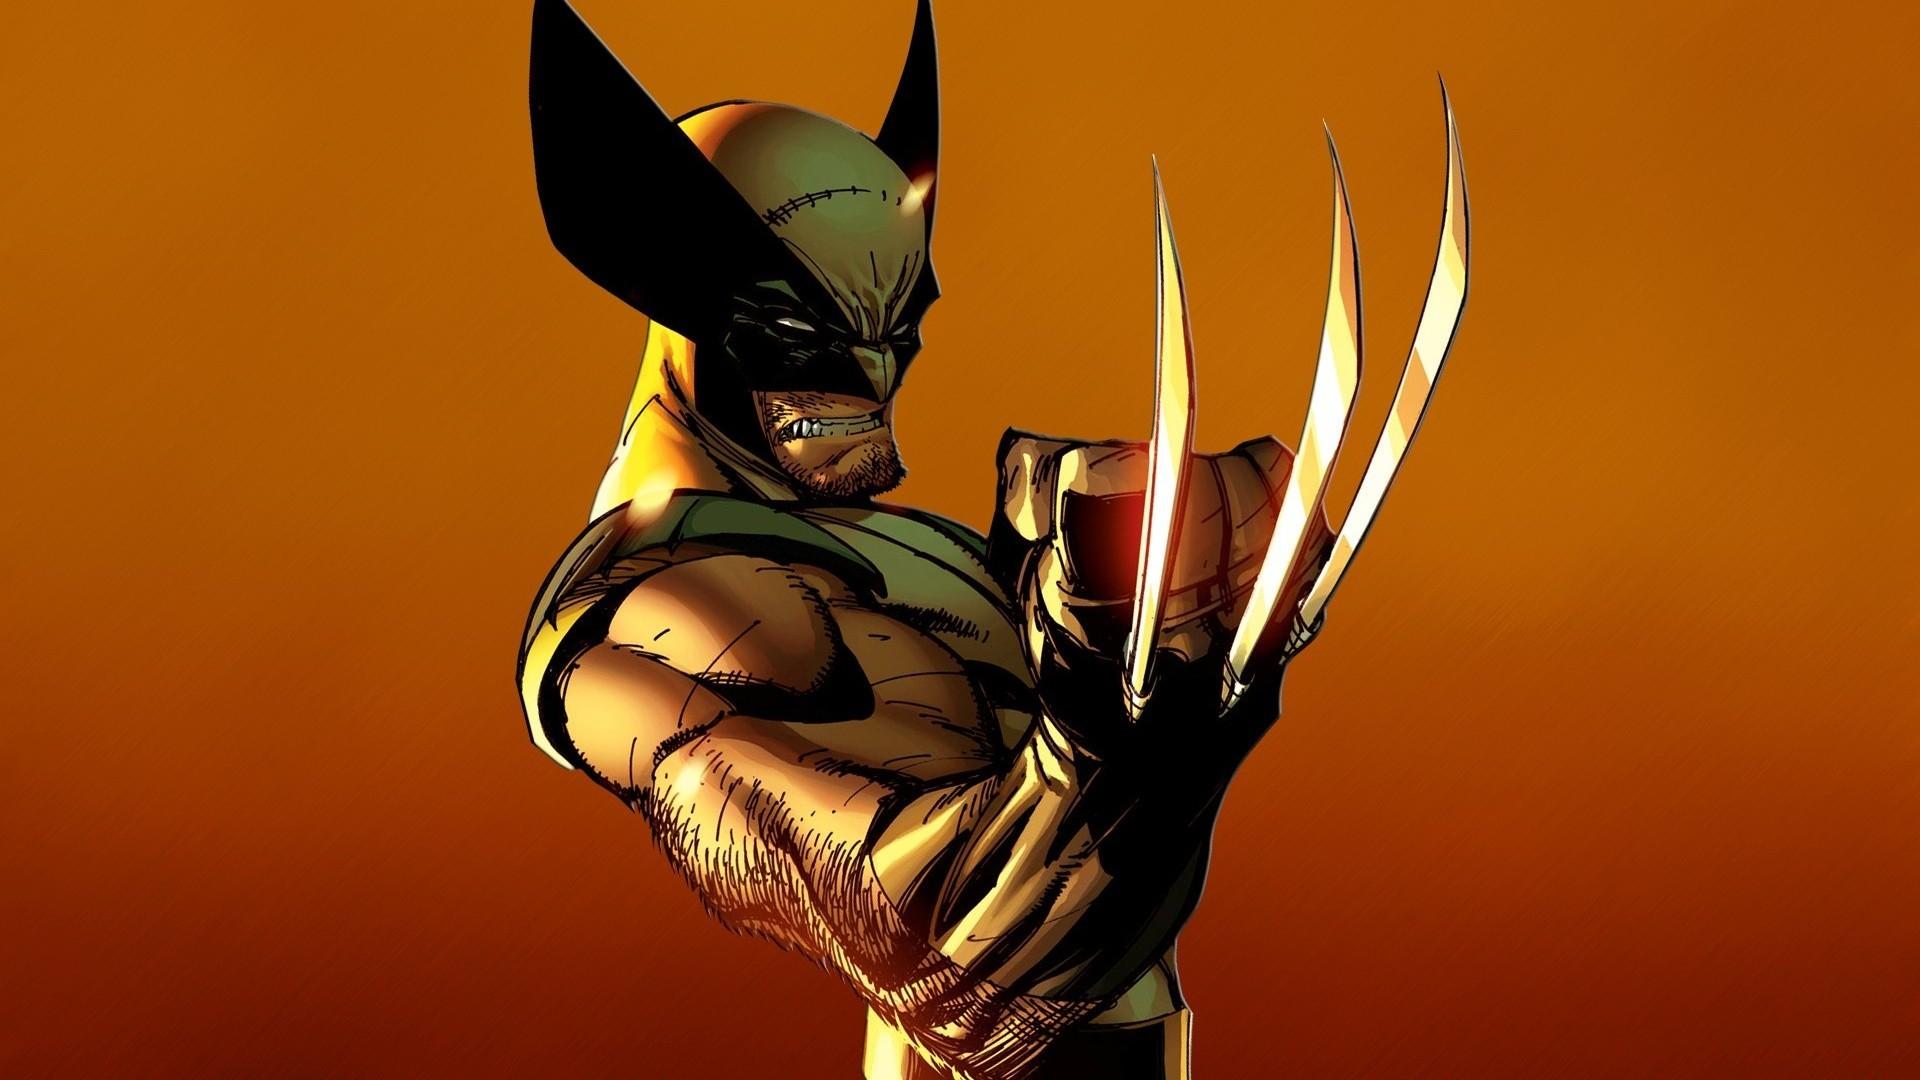 1920x1080 Marvel Superheroes Wallpaper